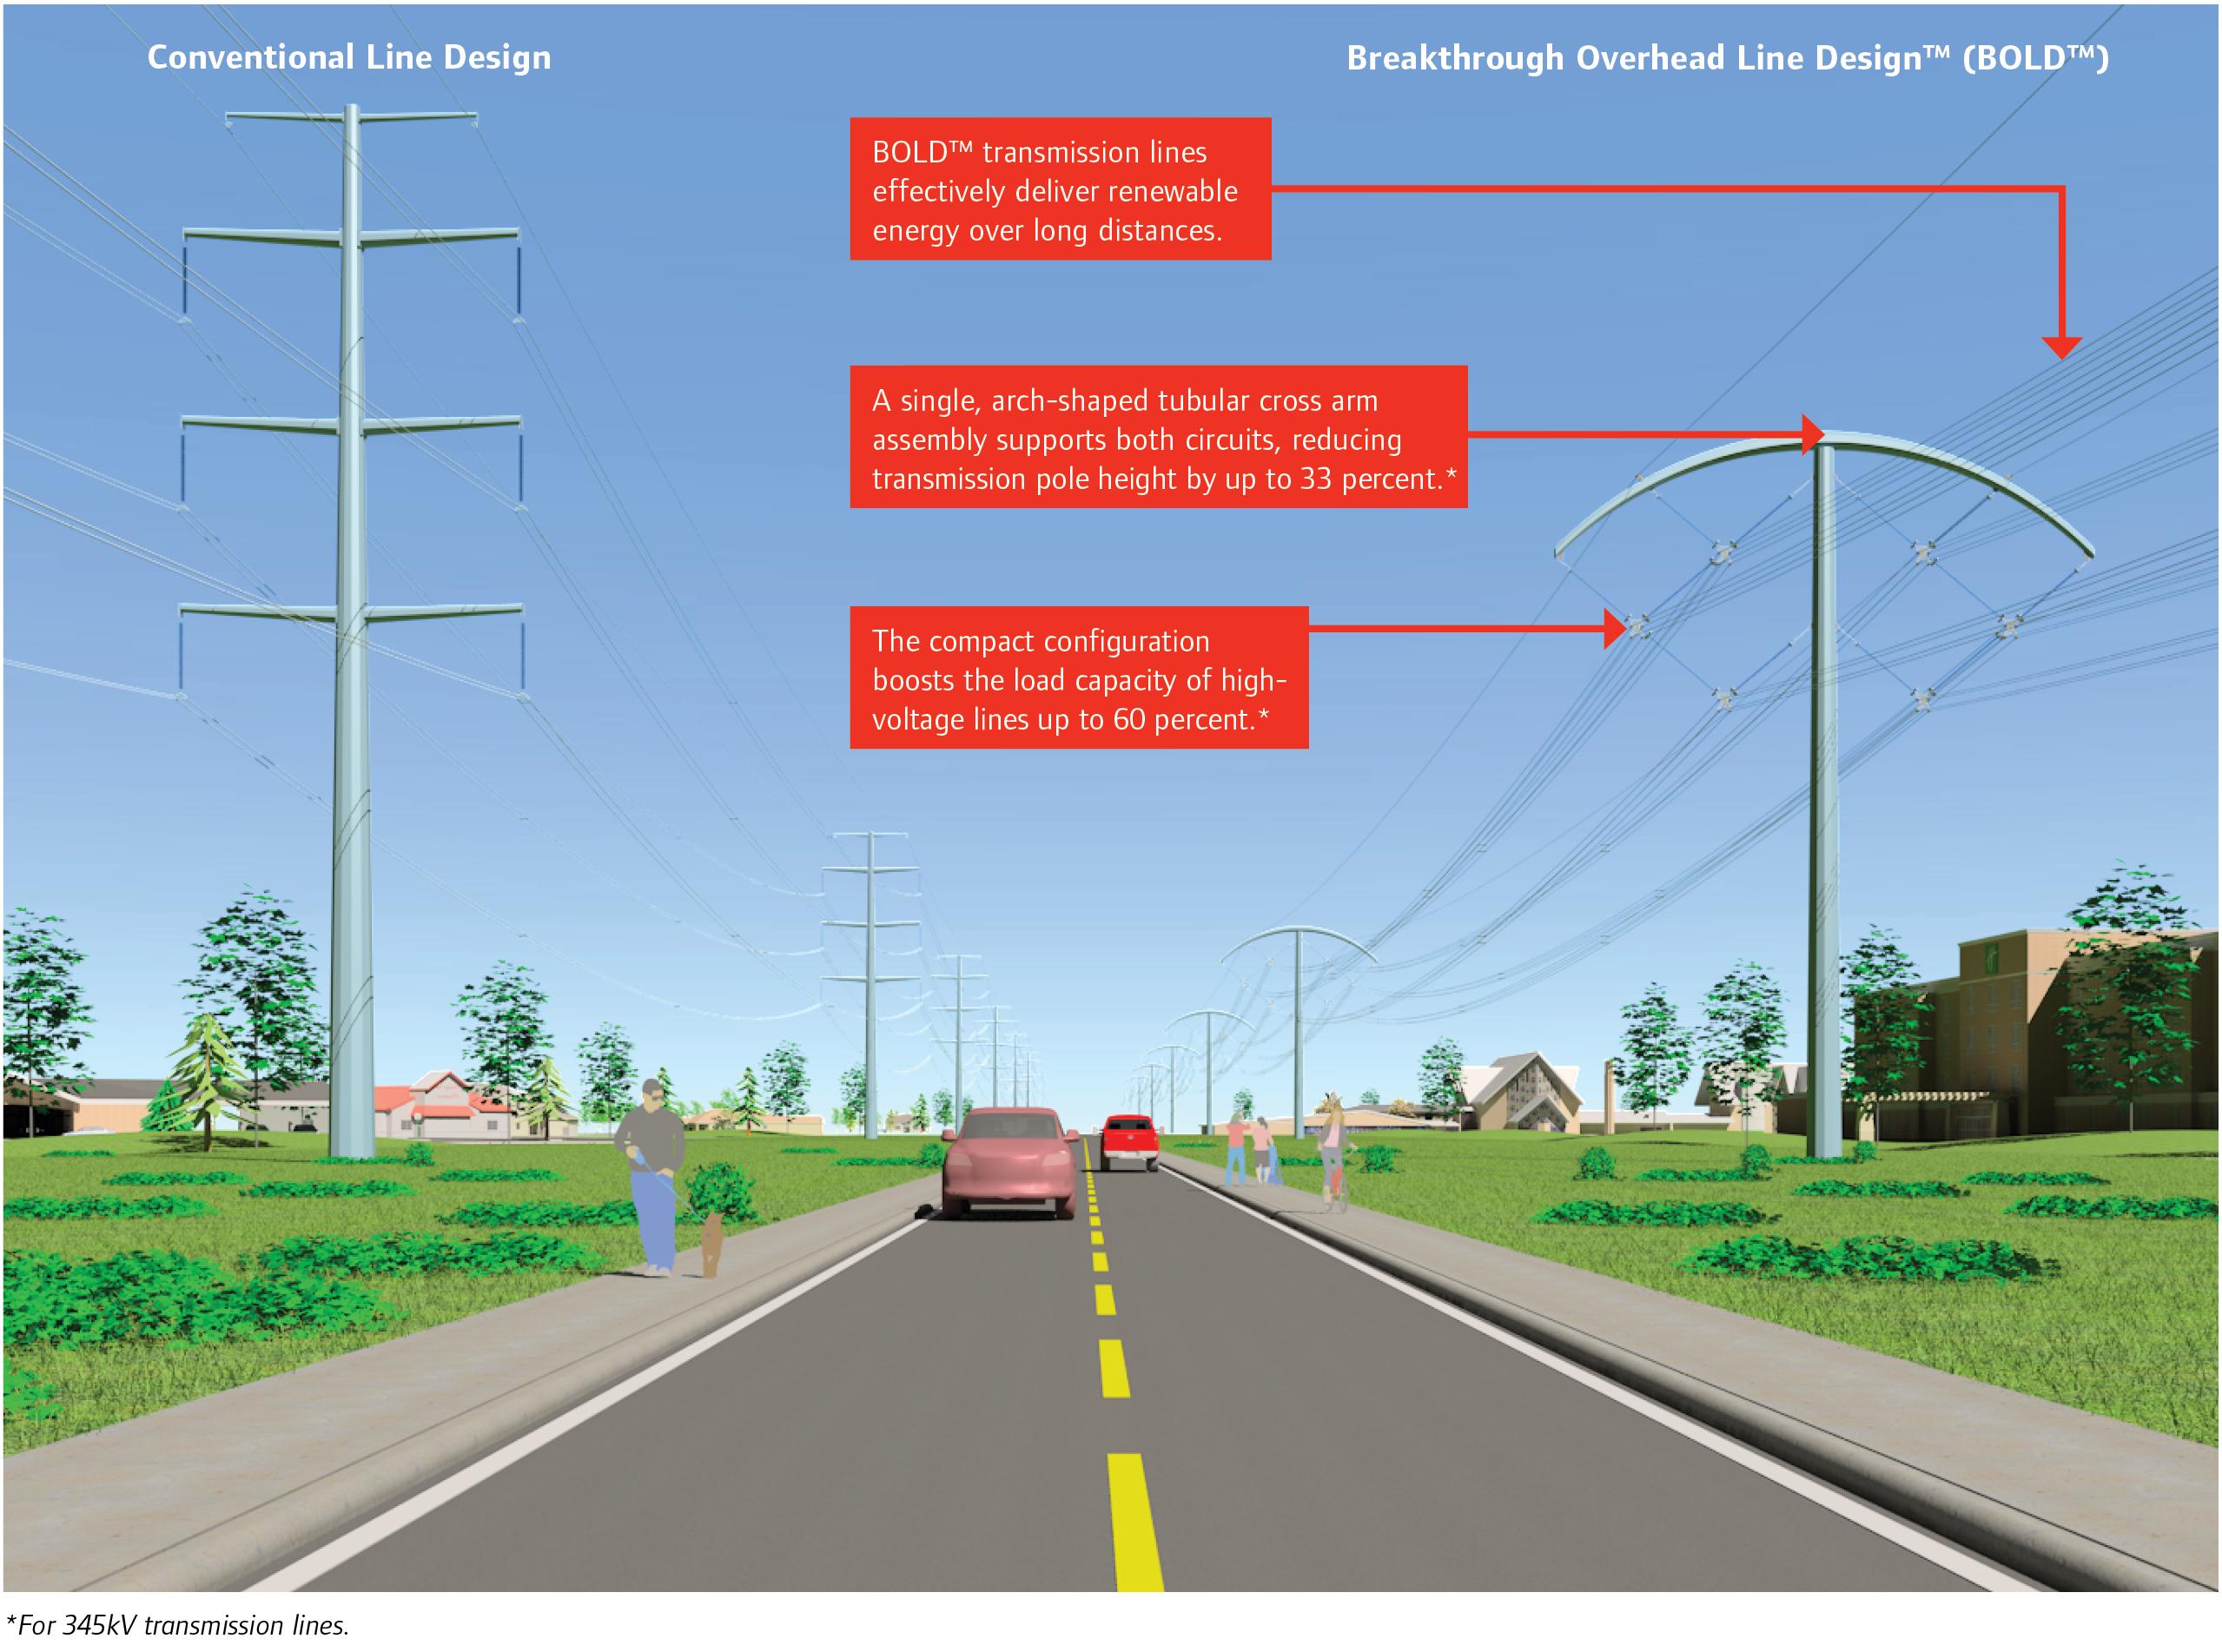 Breakthrough Overhead Line Design™